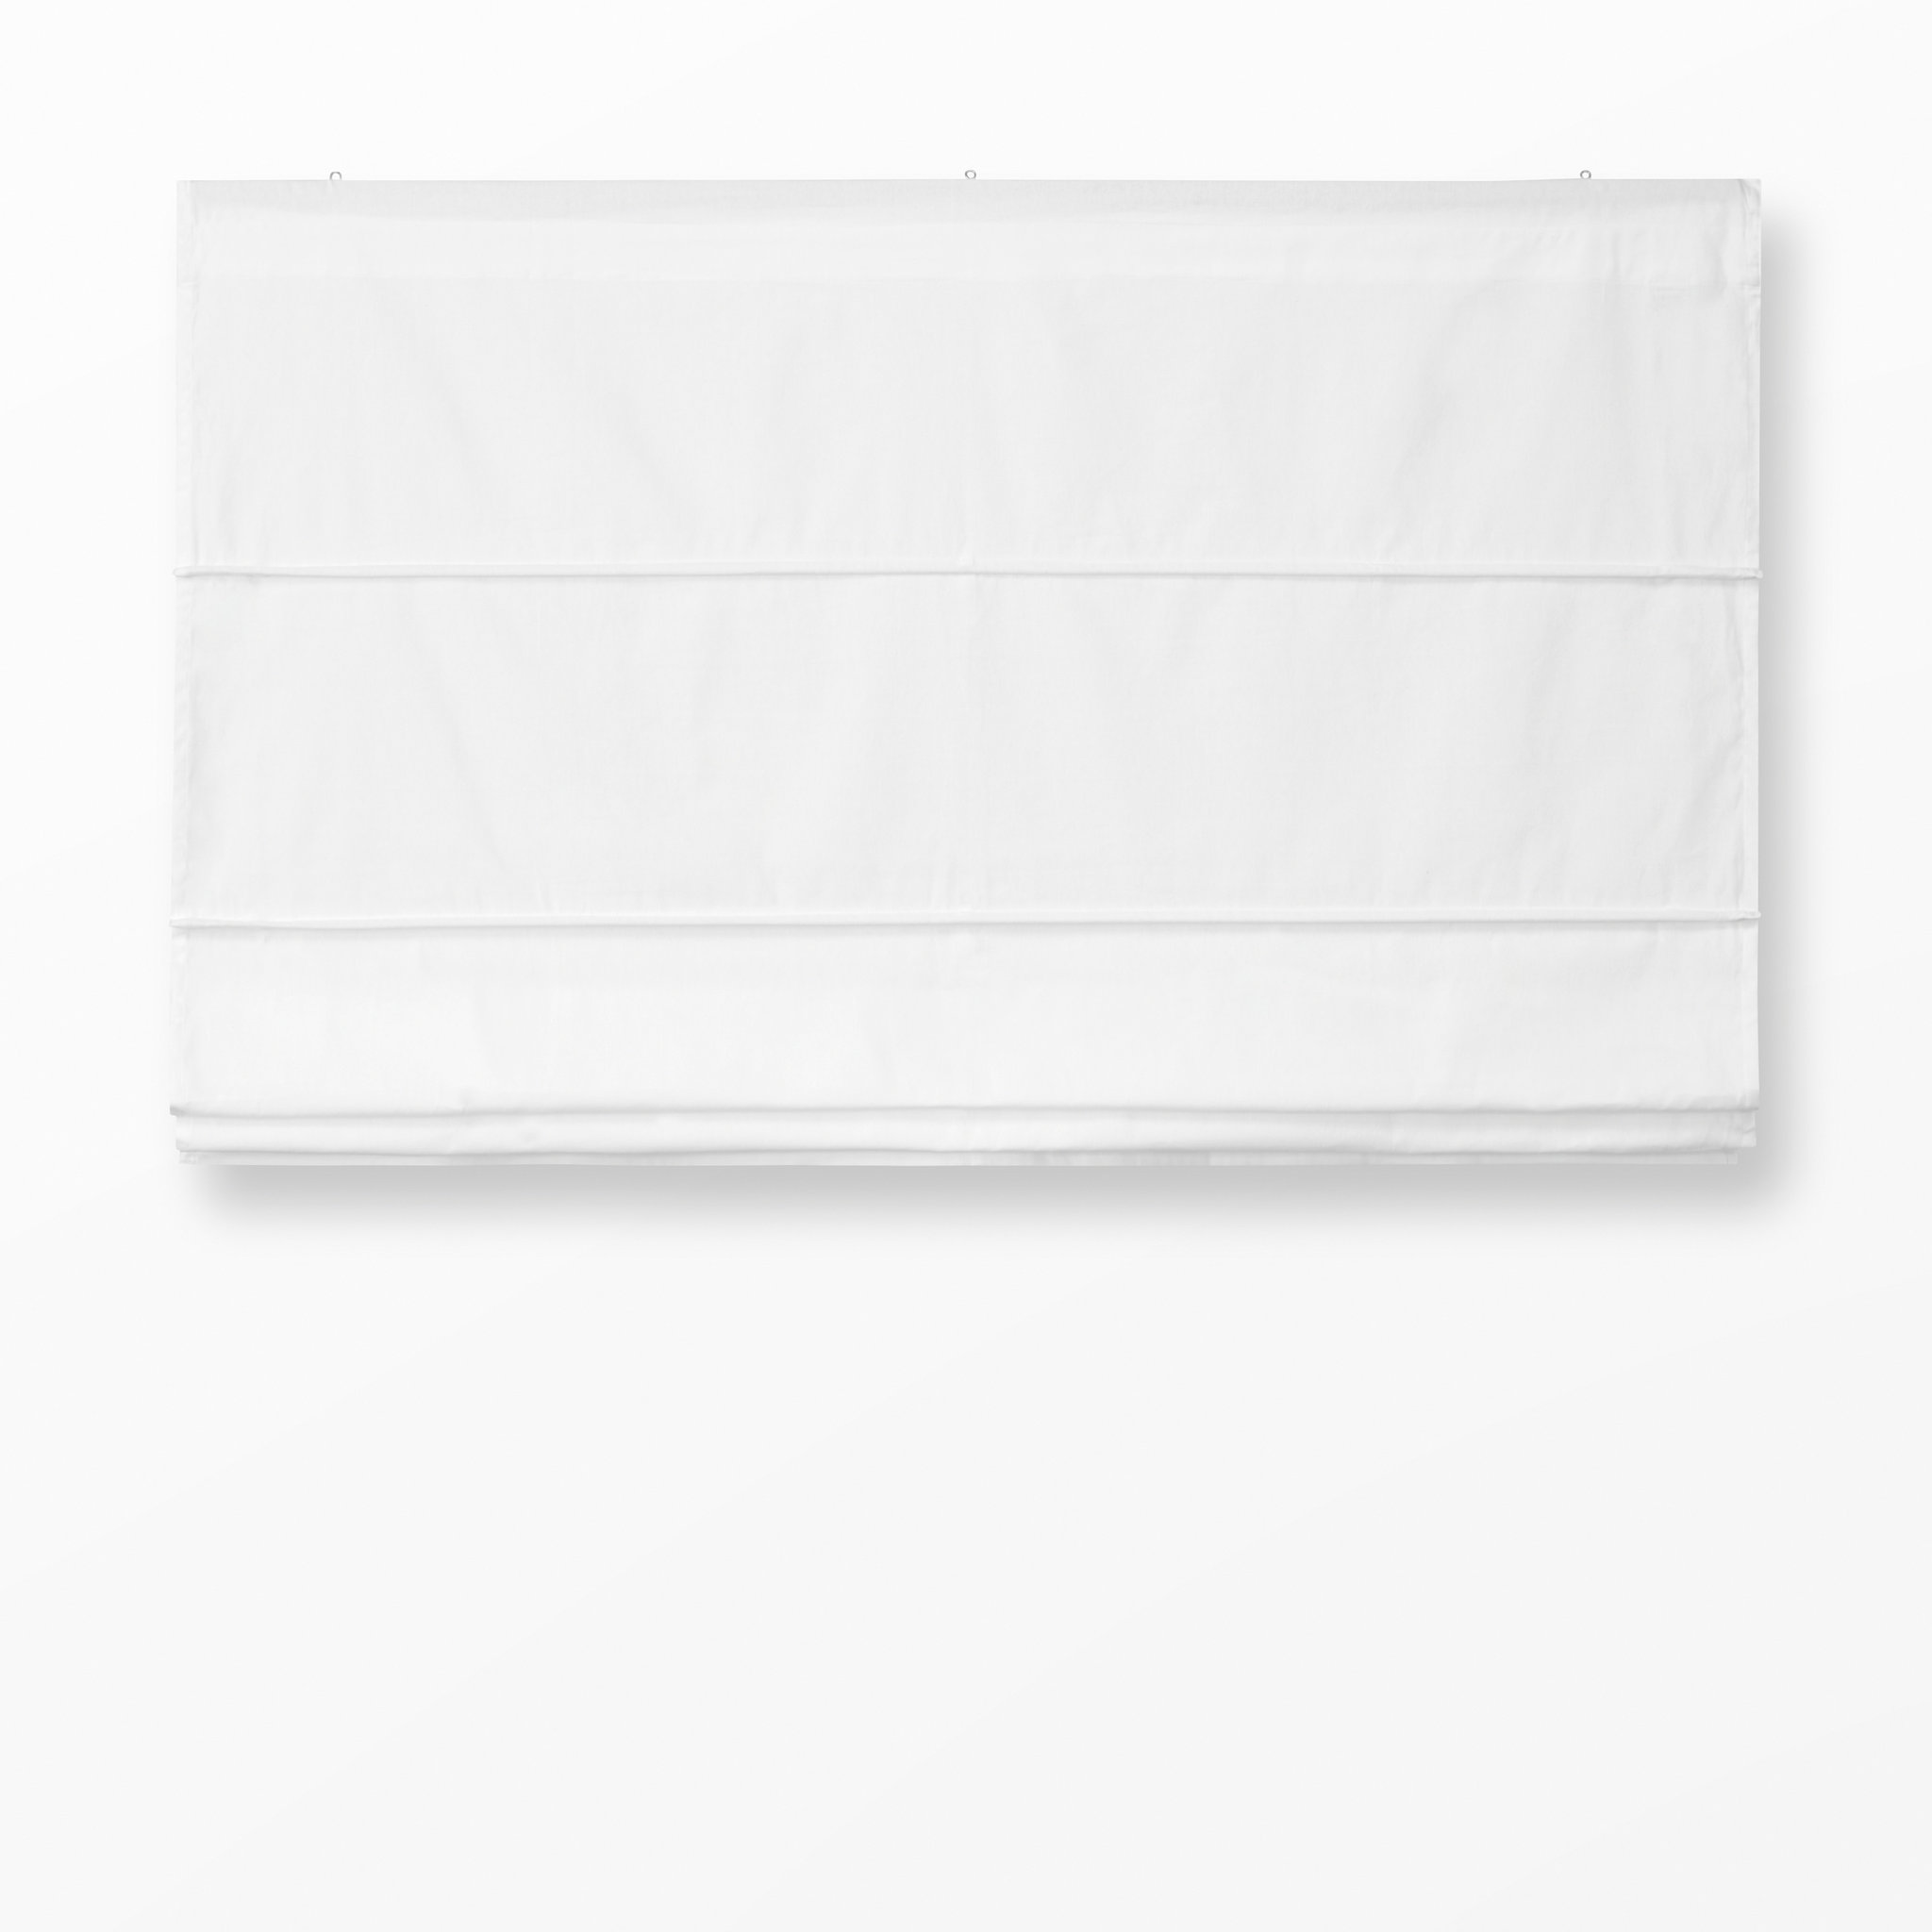 Hissgardin Steg, 100x170 cm